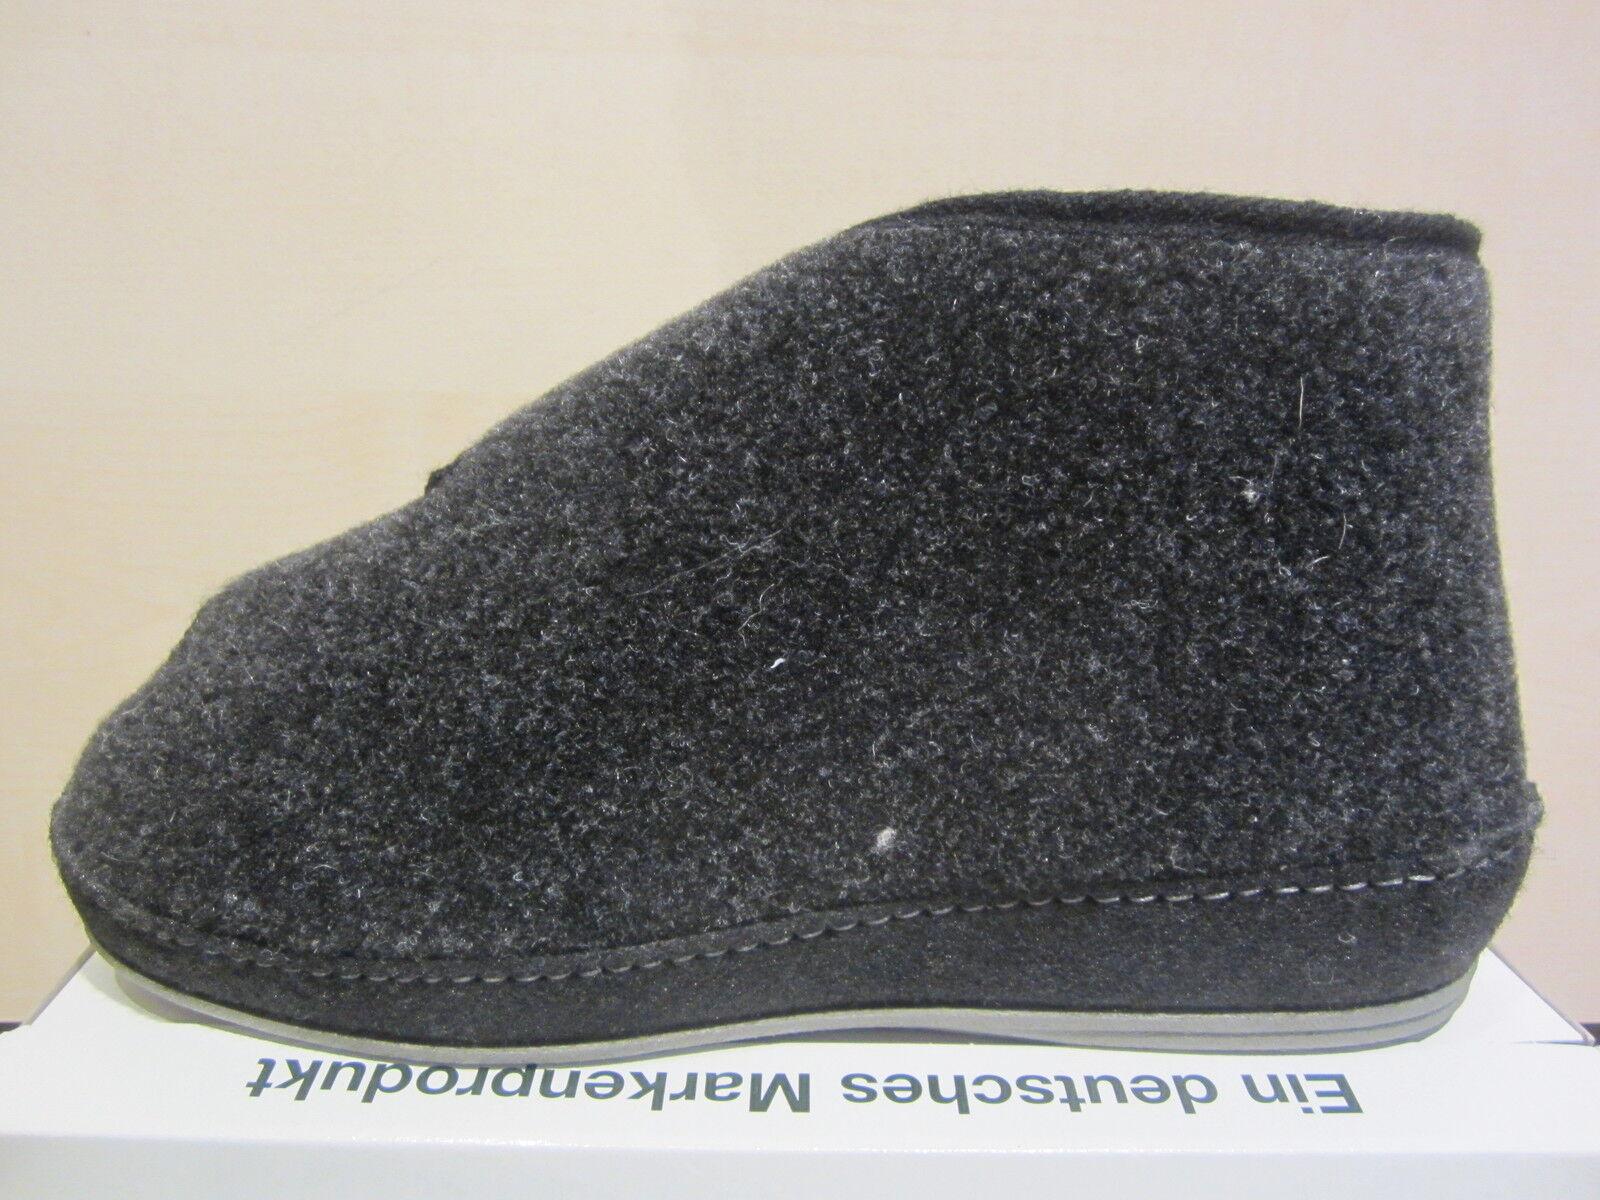 Schawos Herren Hausschuh  Hausschuhe mit Klettverschluss, schwarz  Hausschuh  6062  NEU 4828eb